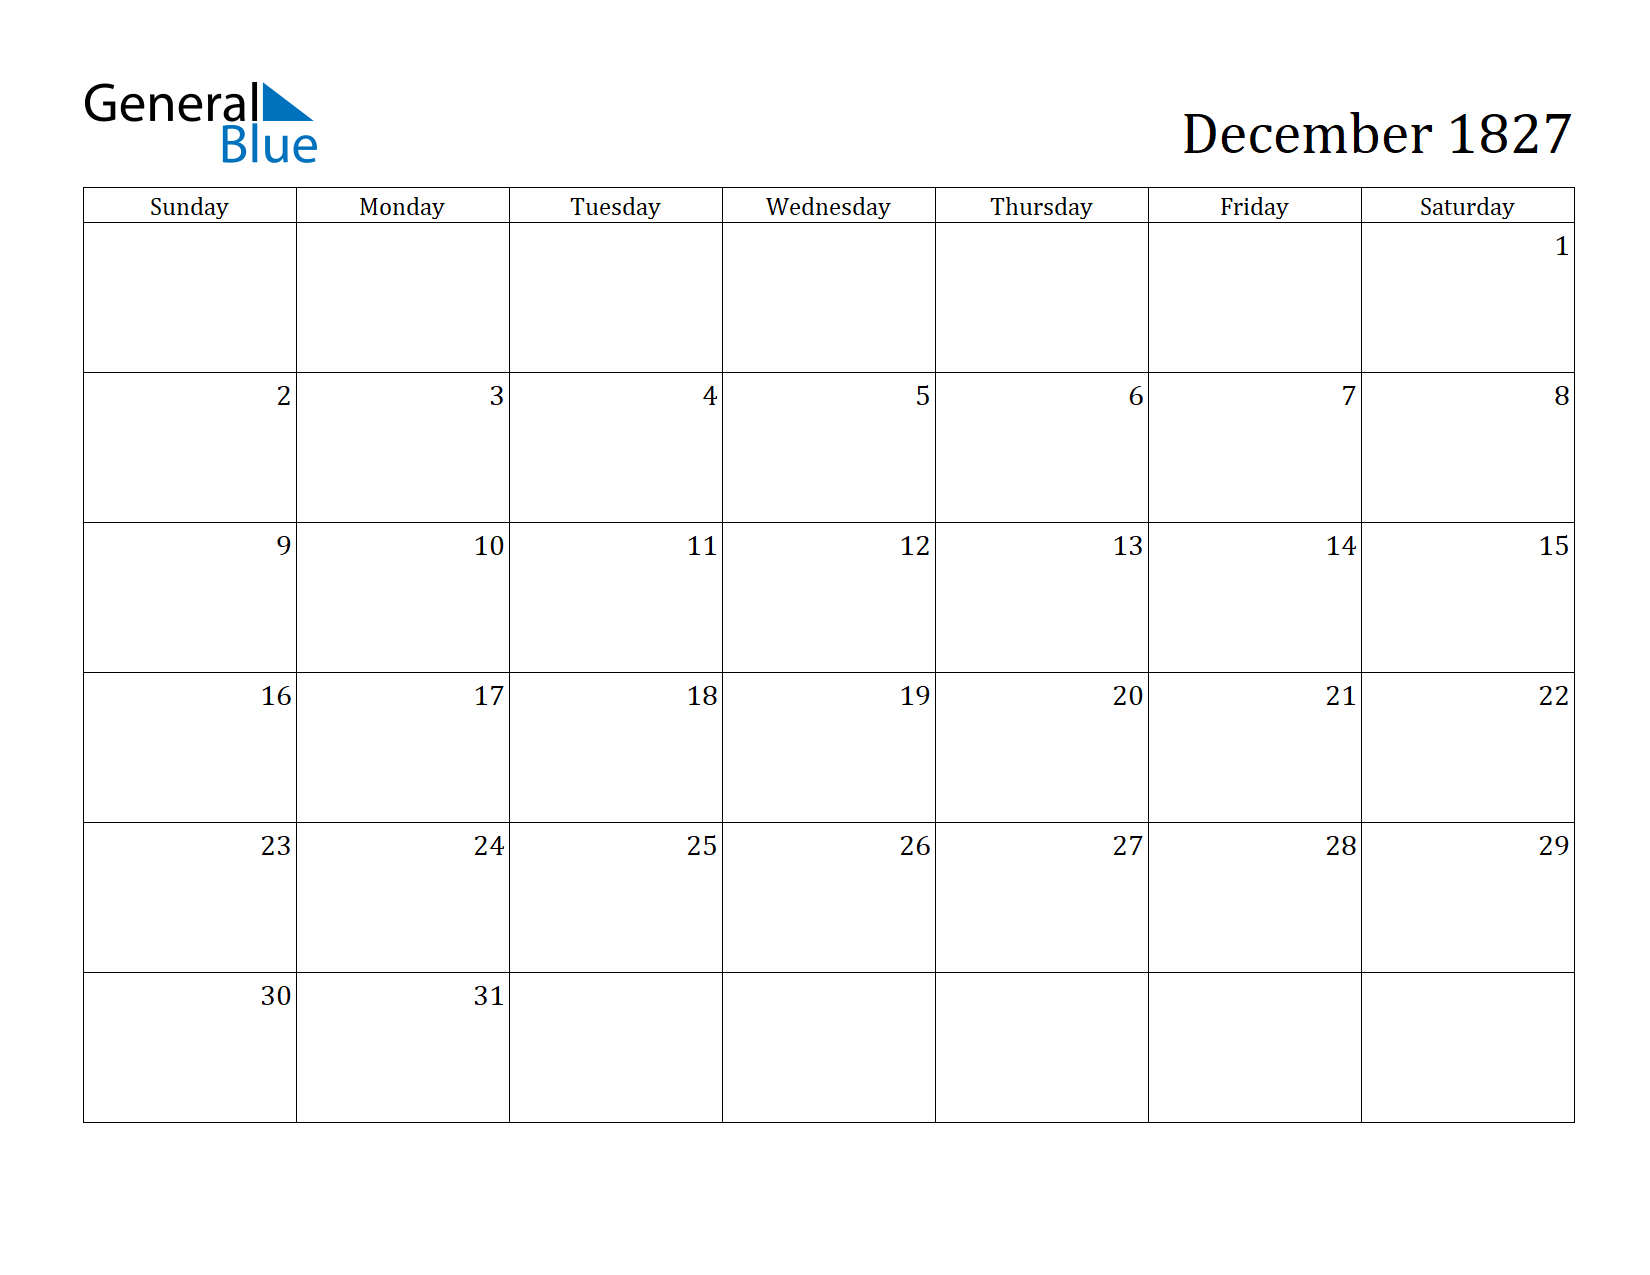 Image of December 1827 Calendar